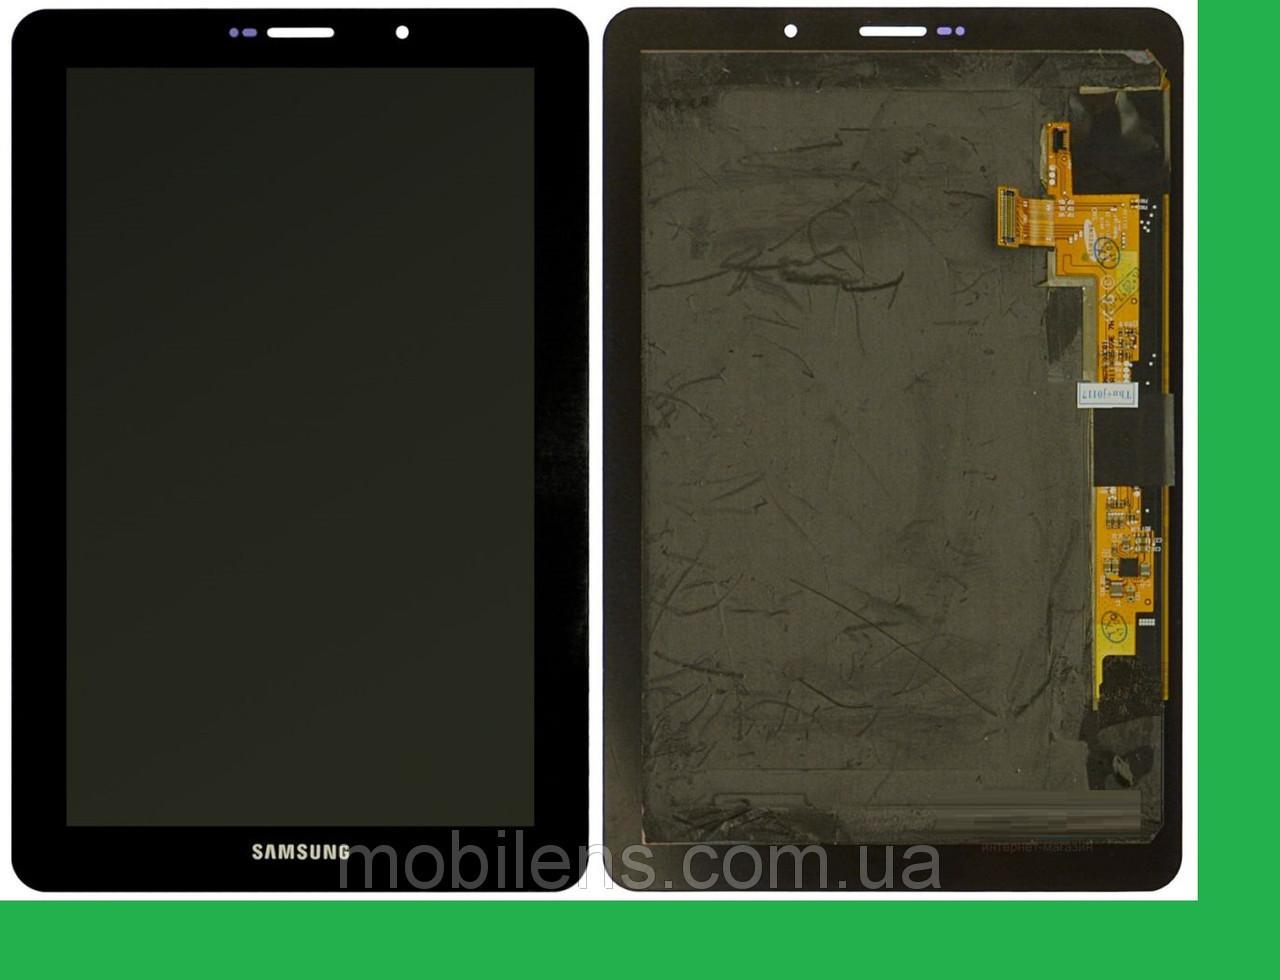 Samsung P6800, Galaxy Tab 7.7 GT-P6800 Дисплей+тачскрин(сенсор) черный